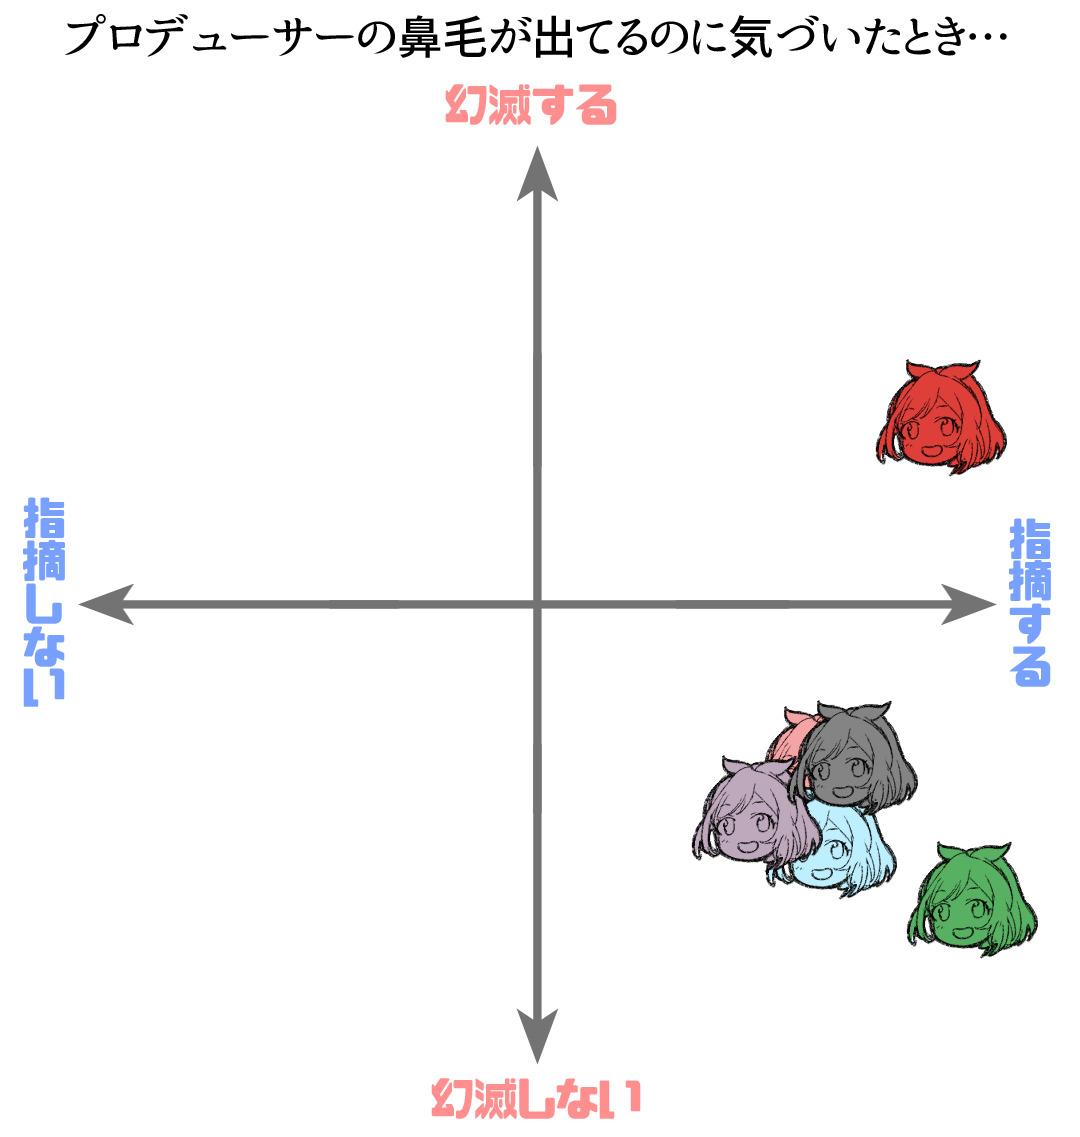 f:id:hoshi_sano:20200414111439j:image:w400